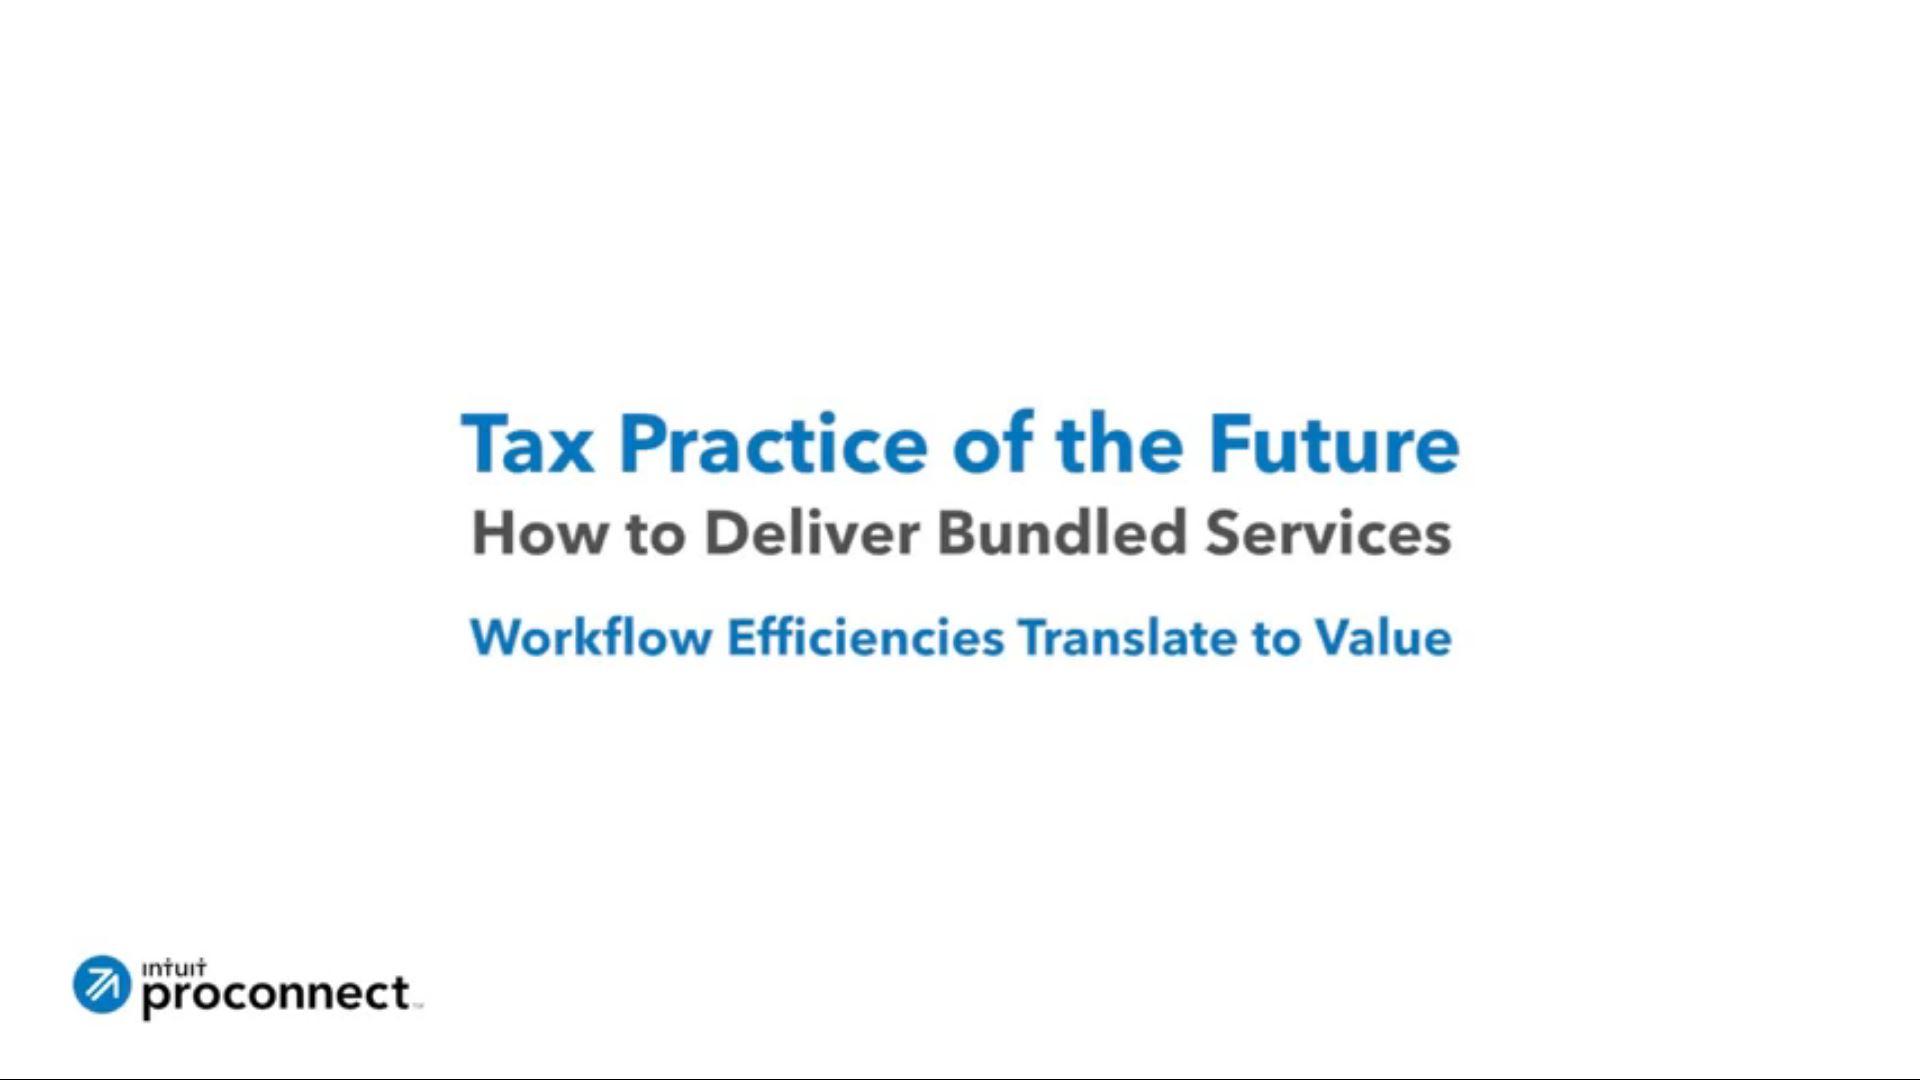 Workflow Efficiencies Can Improve Profits